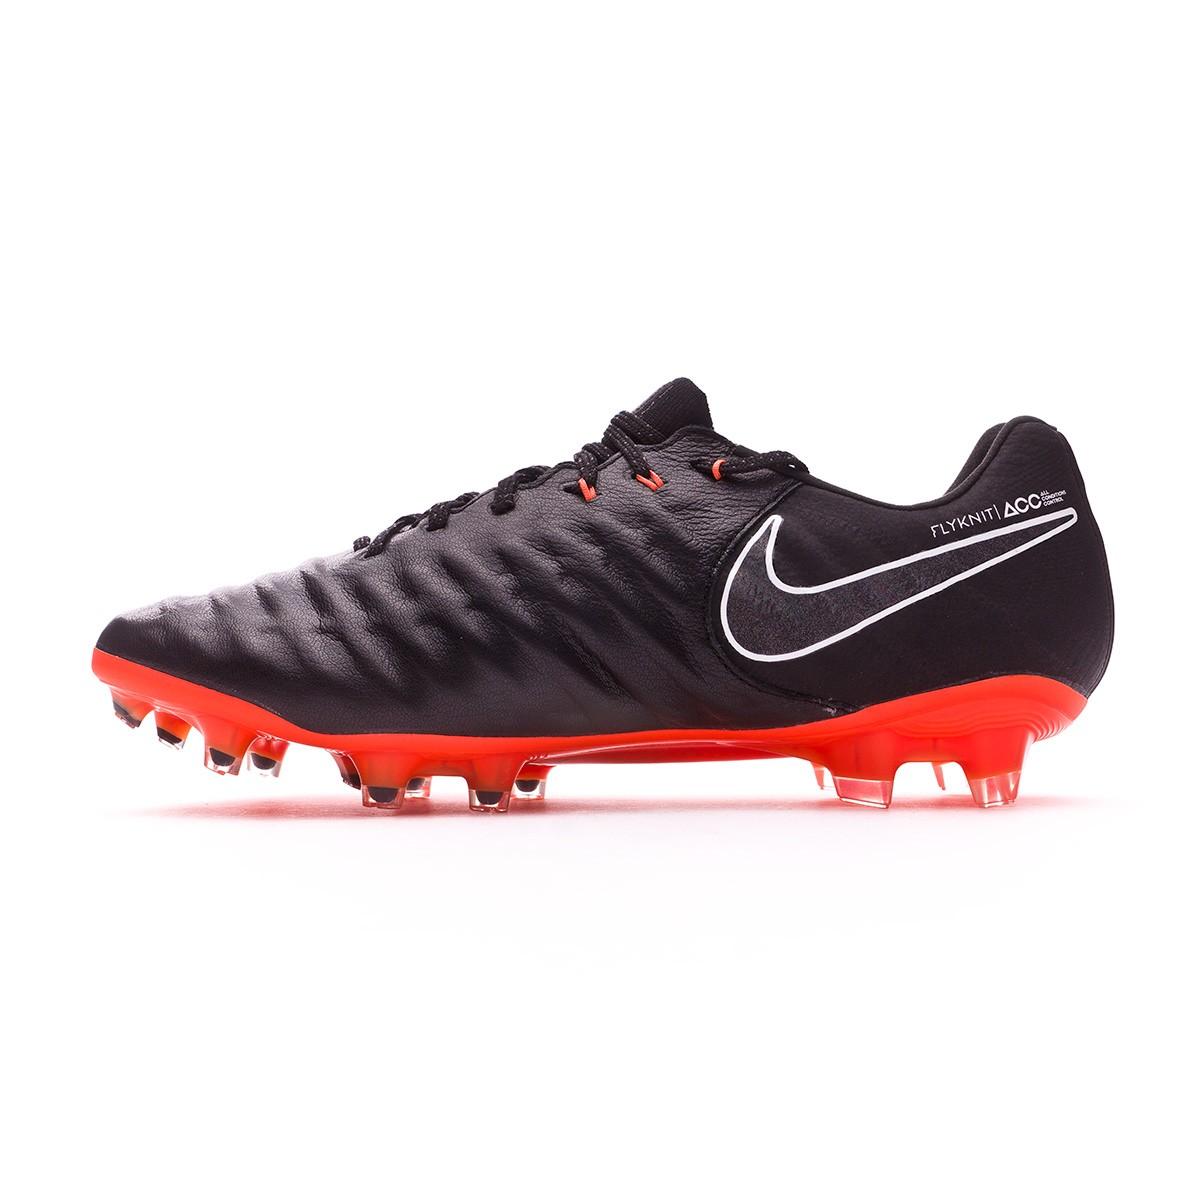 e25e6007e3f Football Boots Nike Tiempo Legend VII Elite FG Black-Total orange-White -  Football store Fútbol Emotion